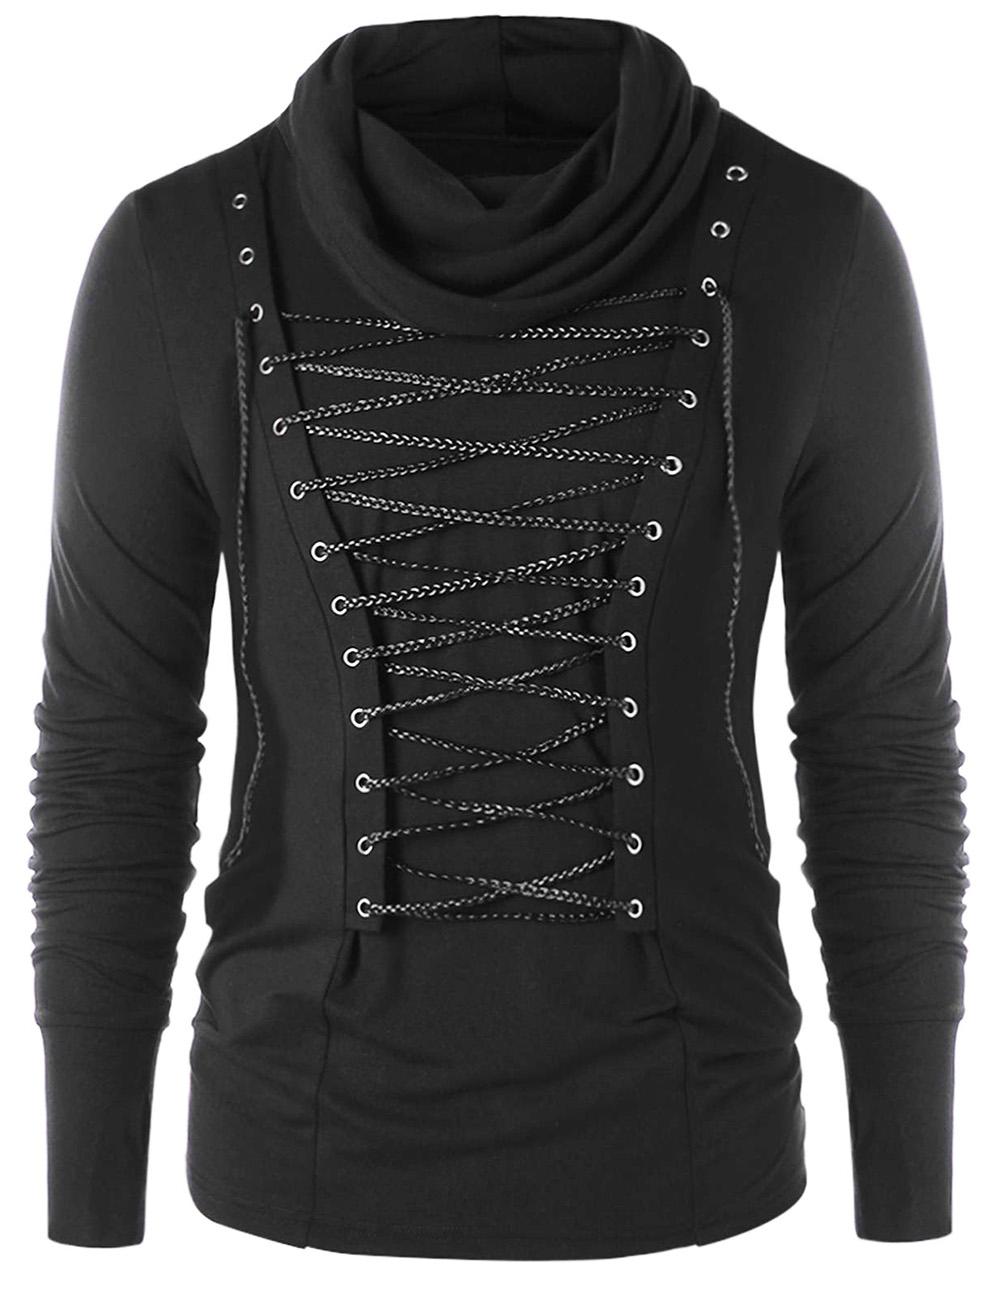 Men Stylish Slim Thermal High Collar Long Sleeve Knitwear Braided Rope Decoration Sweater Tops Stretch Shirt black_M